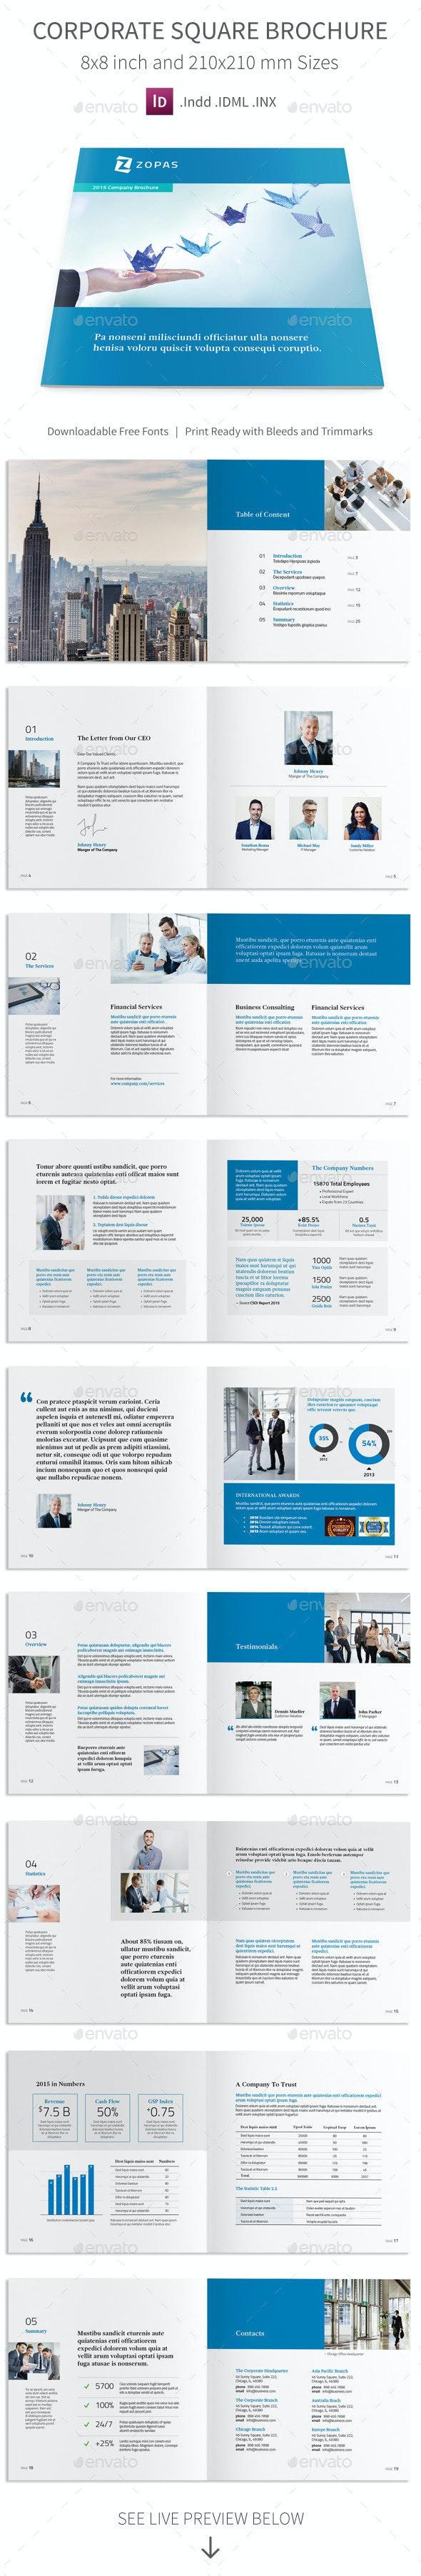 Corporate Company Square Brochure - Corporate Brochures